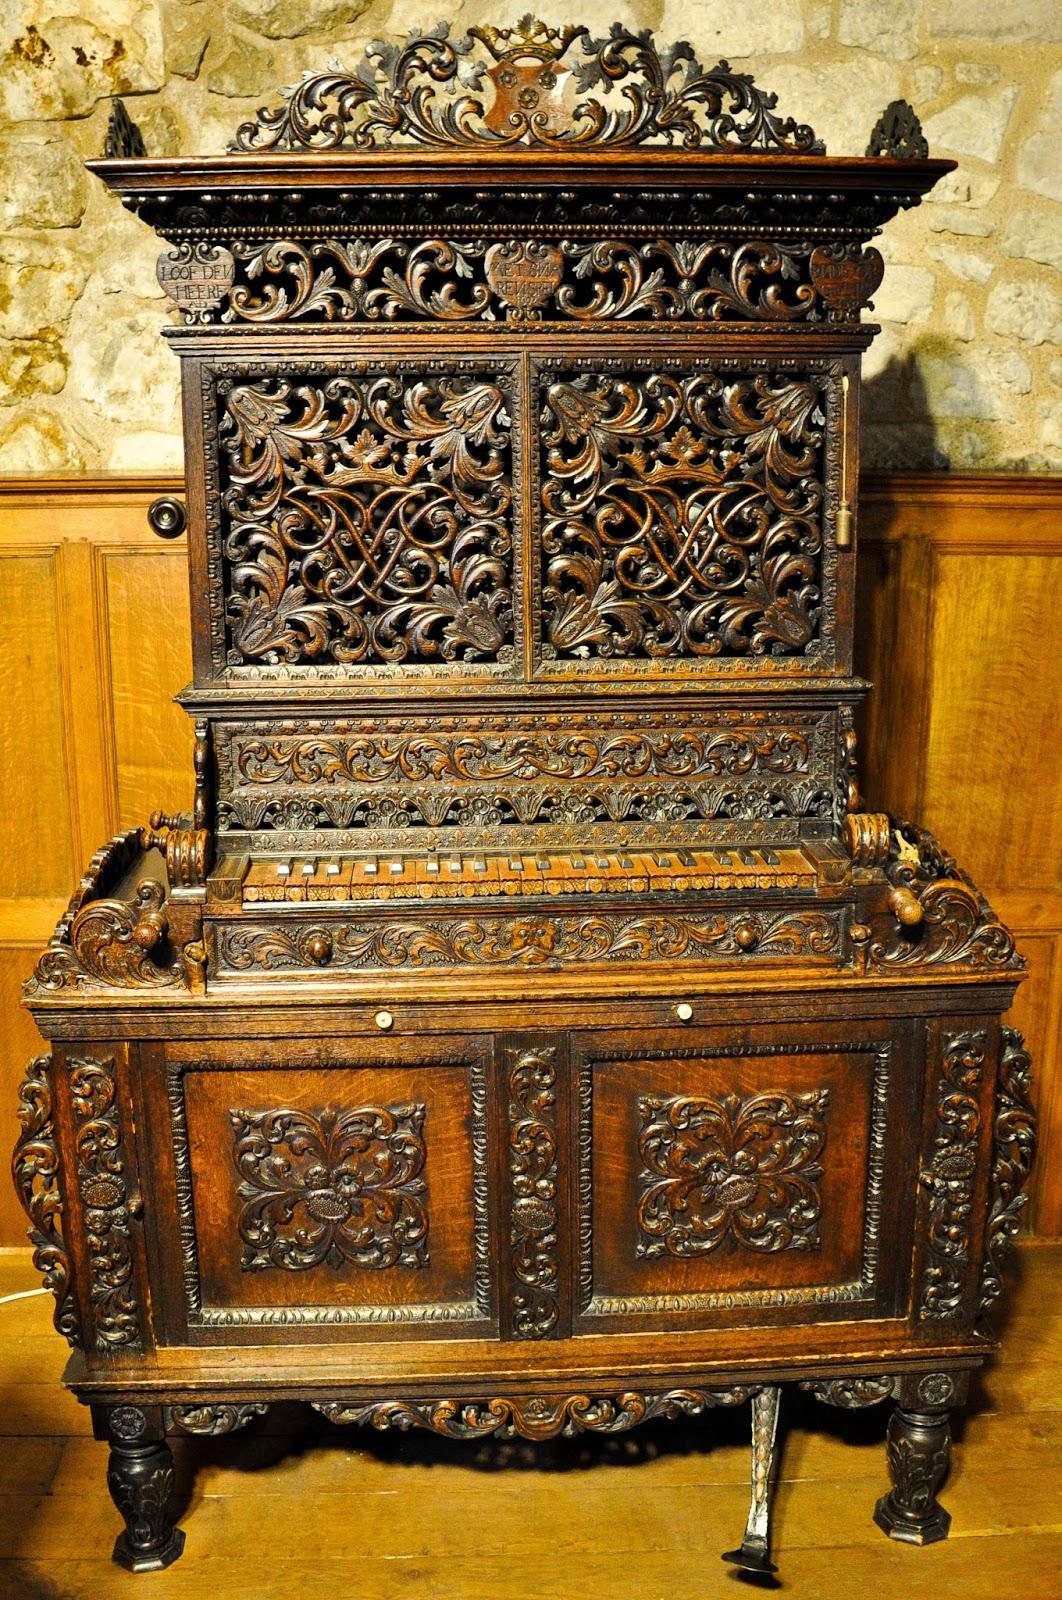 The chamber organ, Carisbrook Castle, Isle of Wight, UK